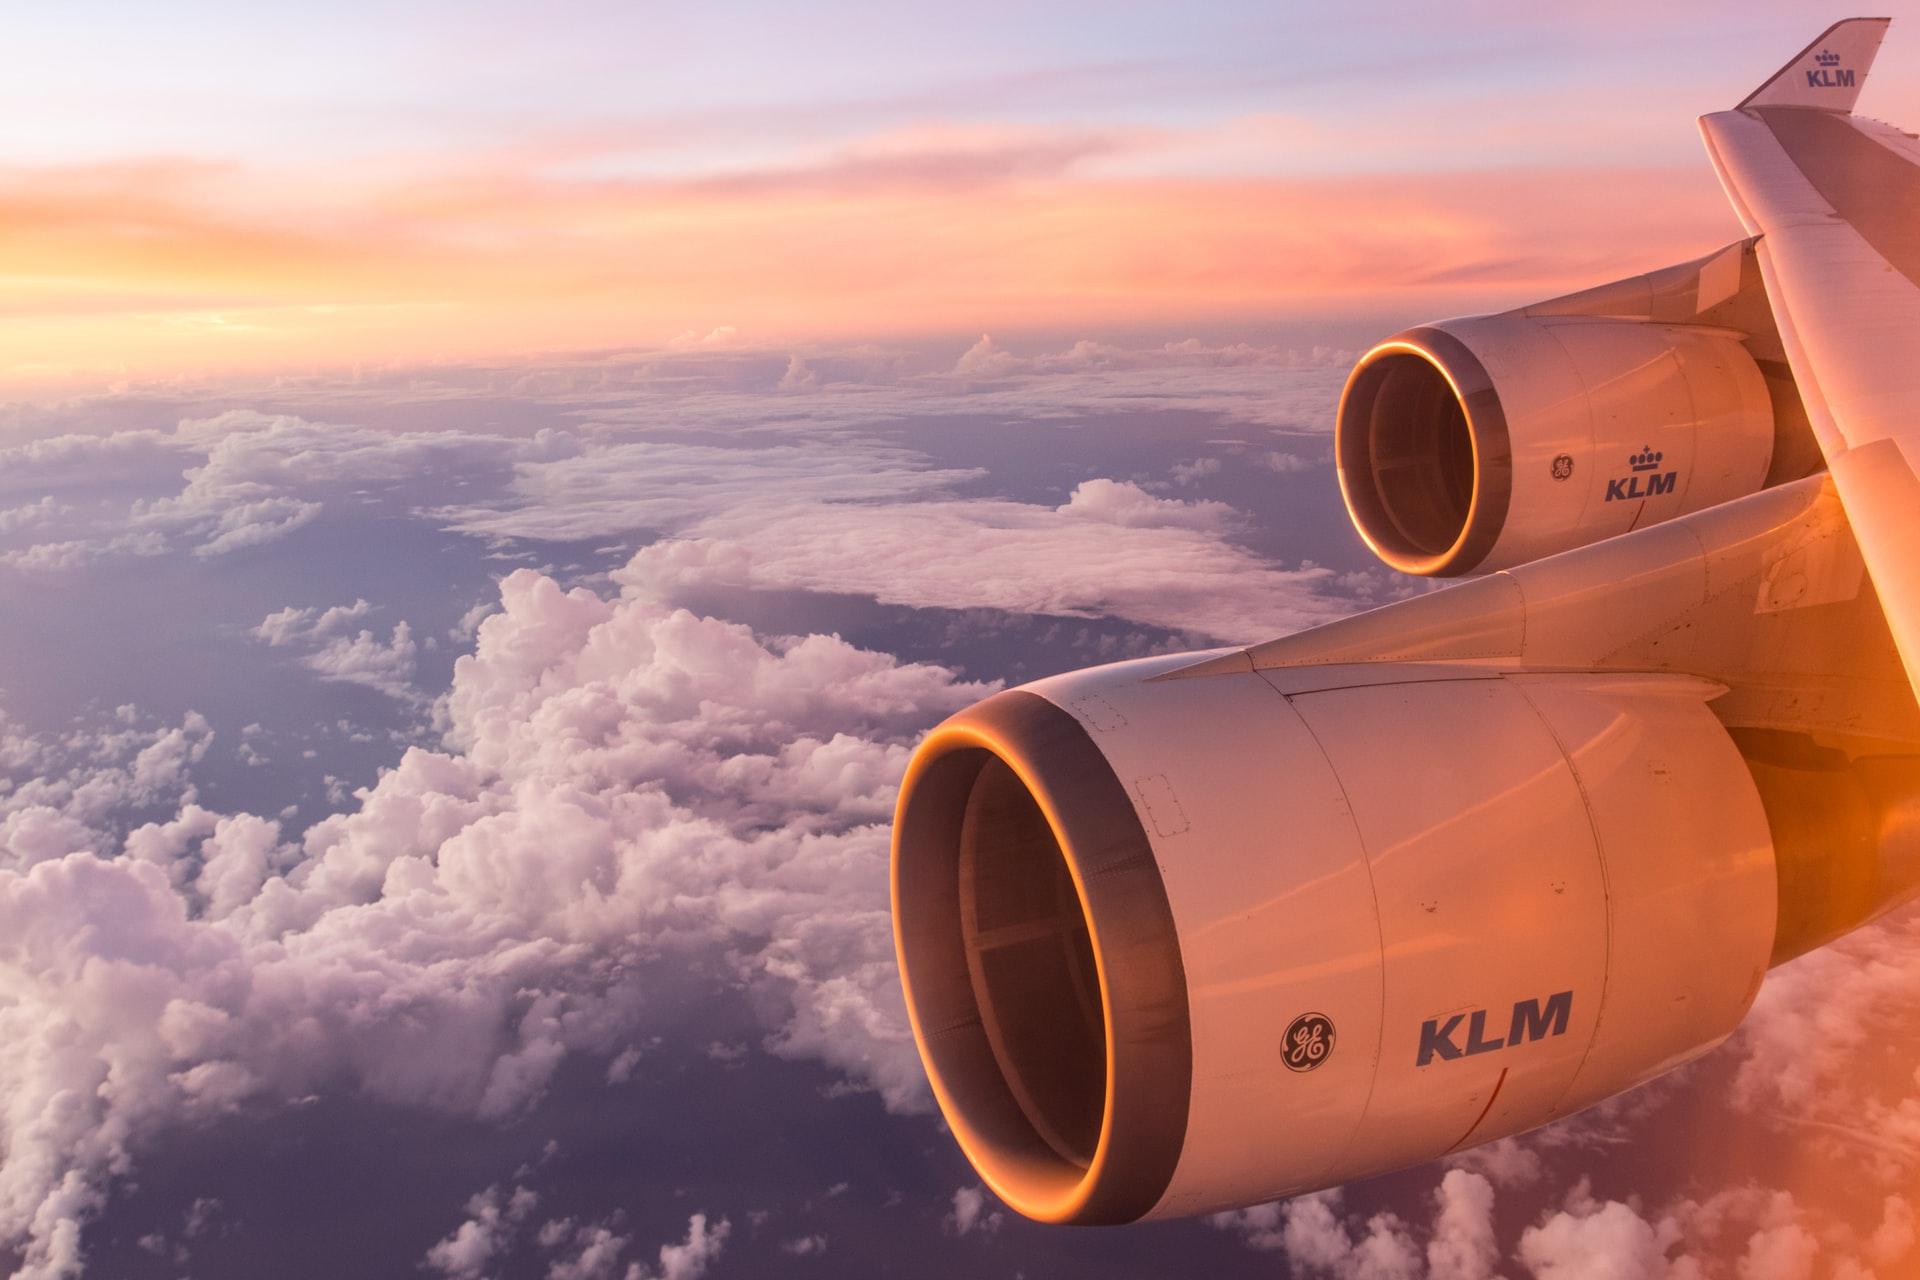 Is Atlas Air Worldwide Holdings (AAWW) A Smart Long-Term Buy?